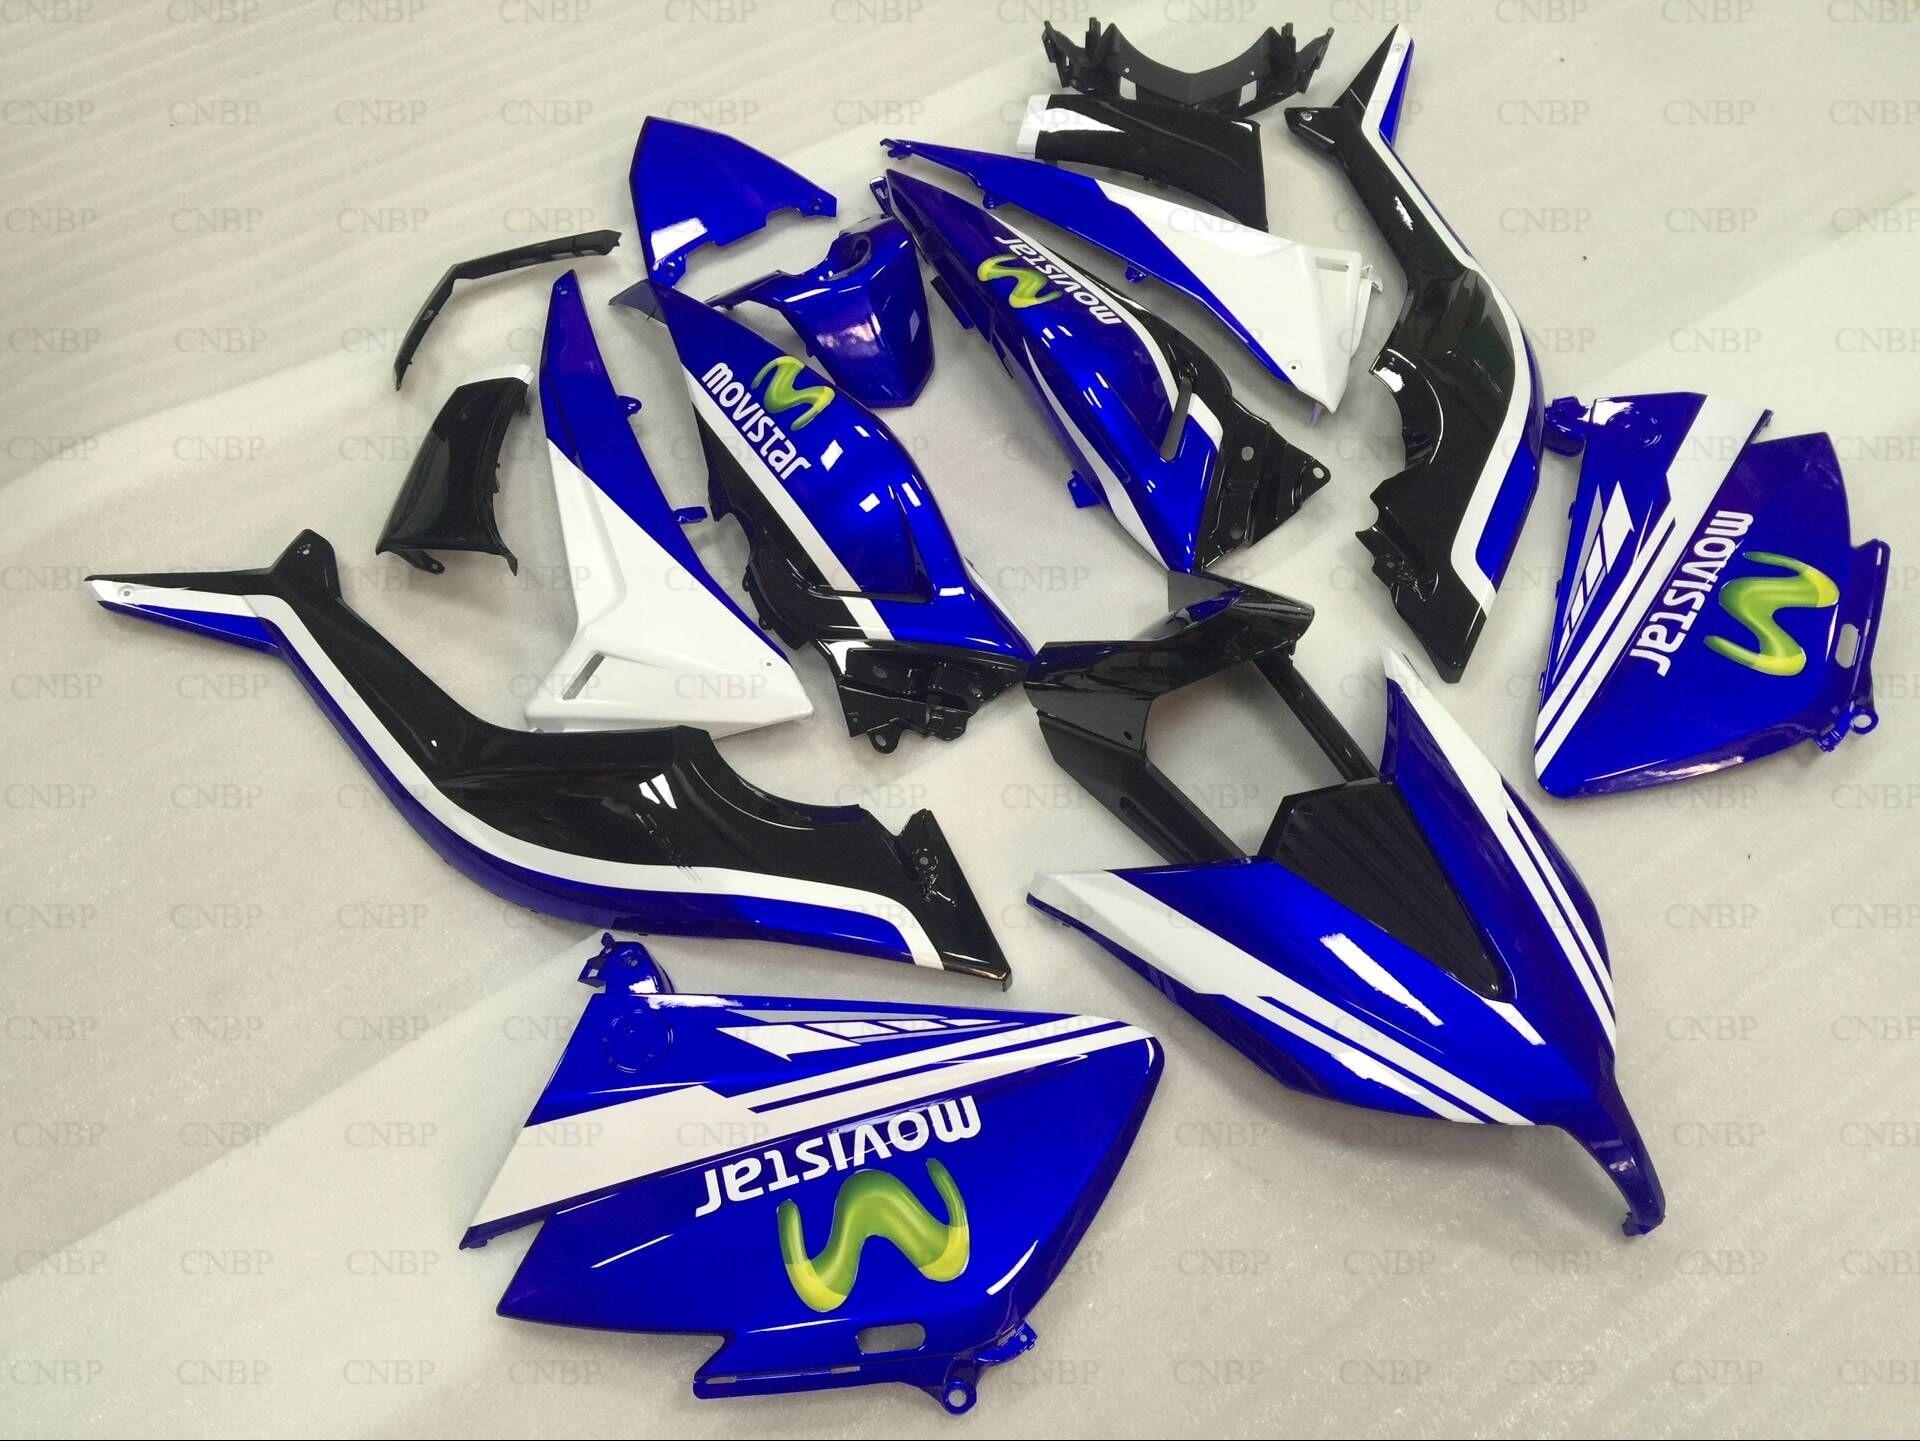 Abs Fairing for YAMAHA TMAX530 15 Abs Fairing T-MAX530 2015 2015 - 2016 Blue for MOVISTAR Body Kits T-MAX530 16